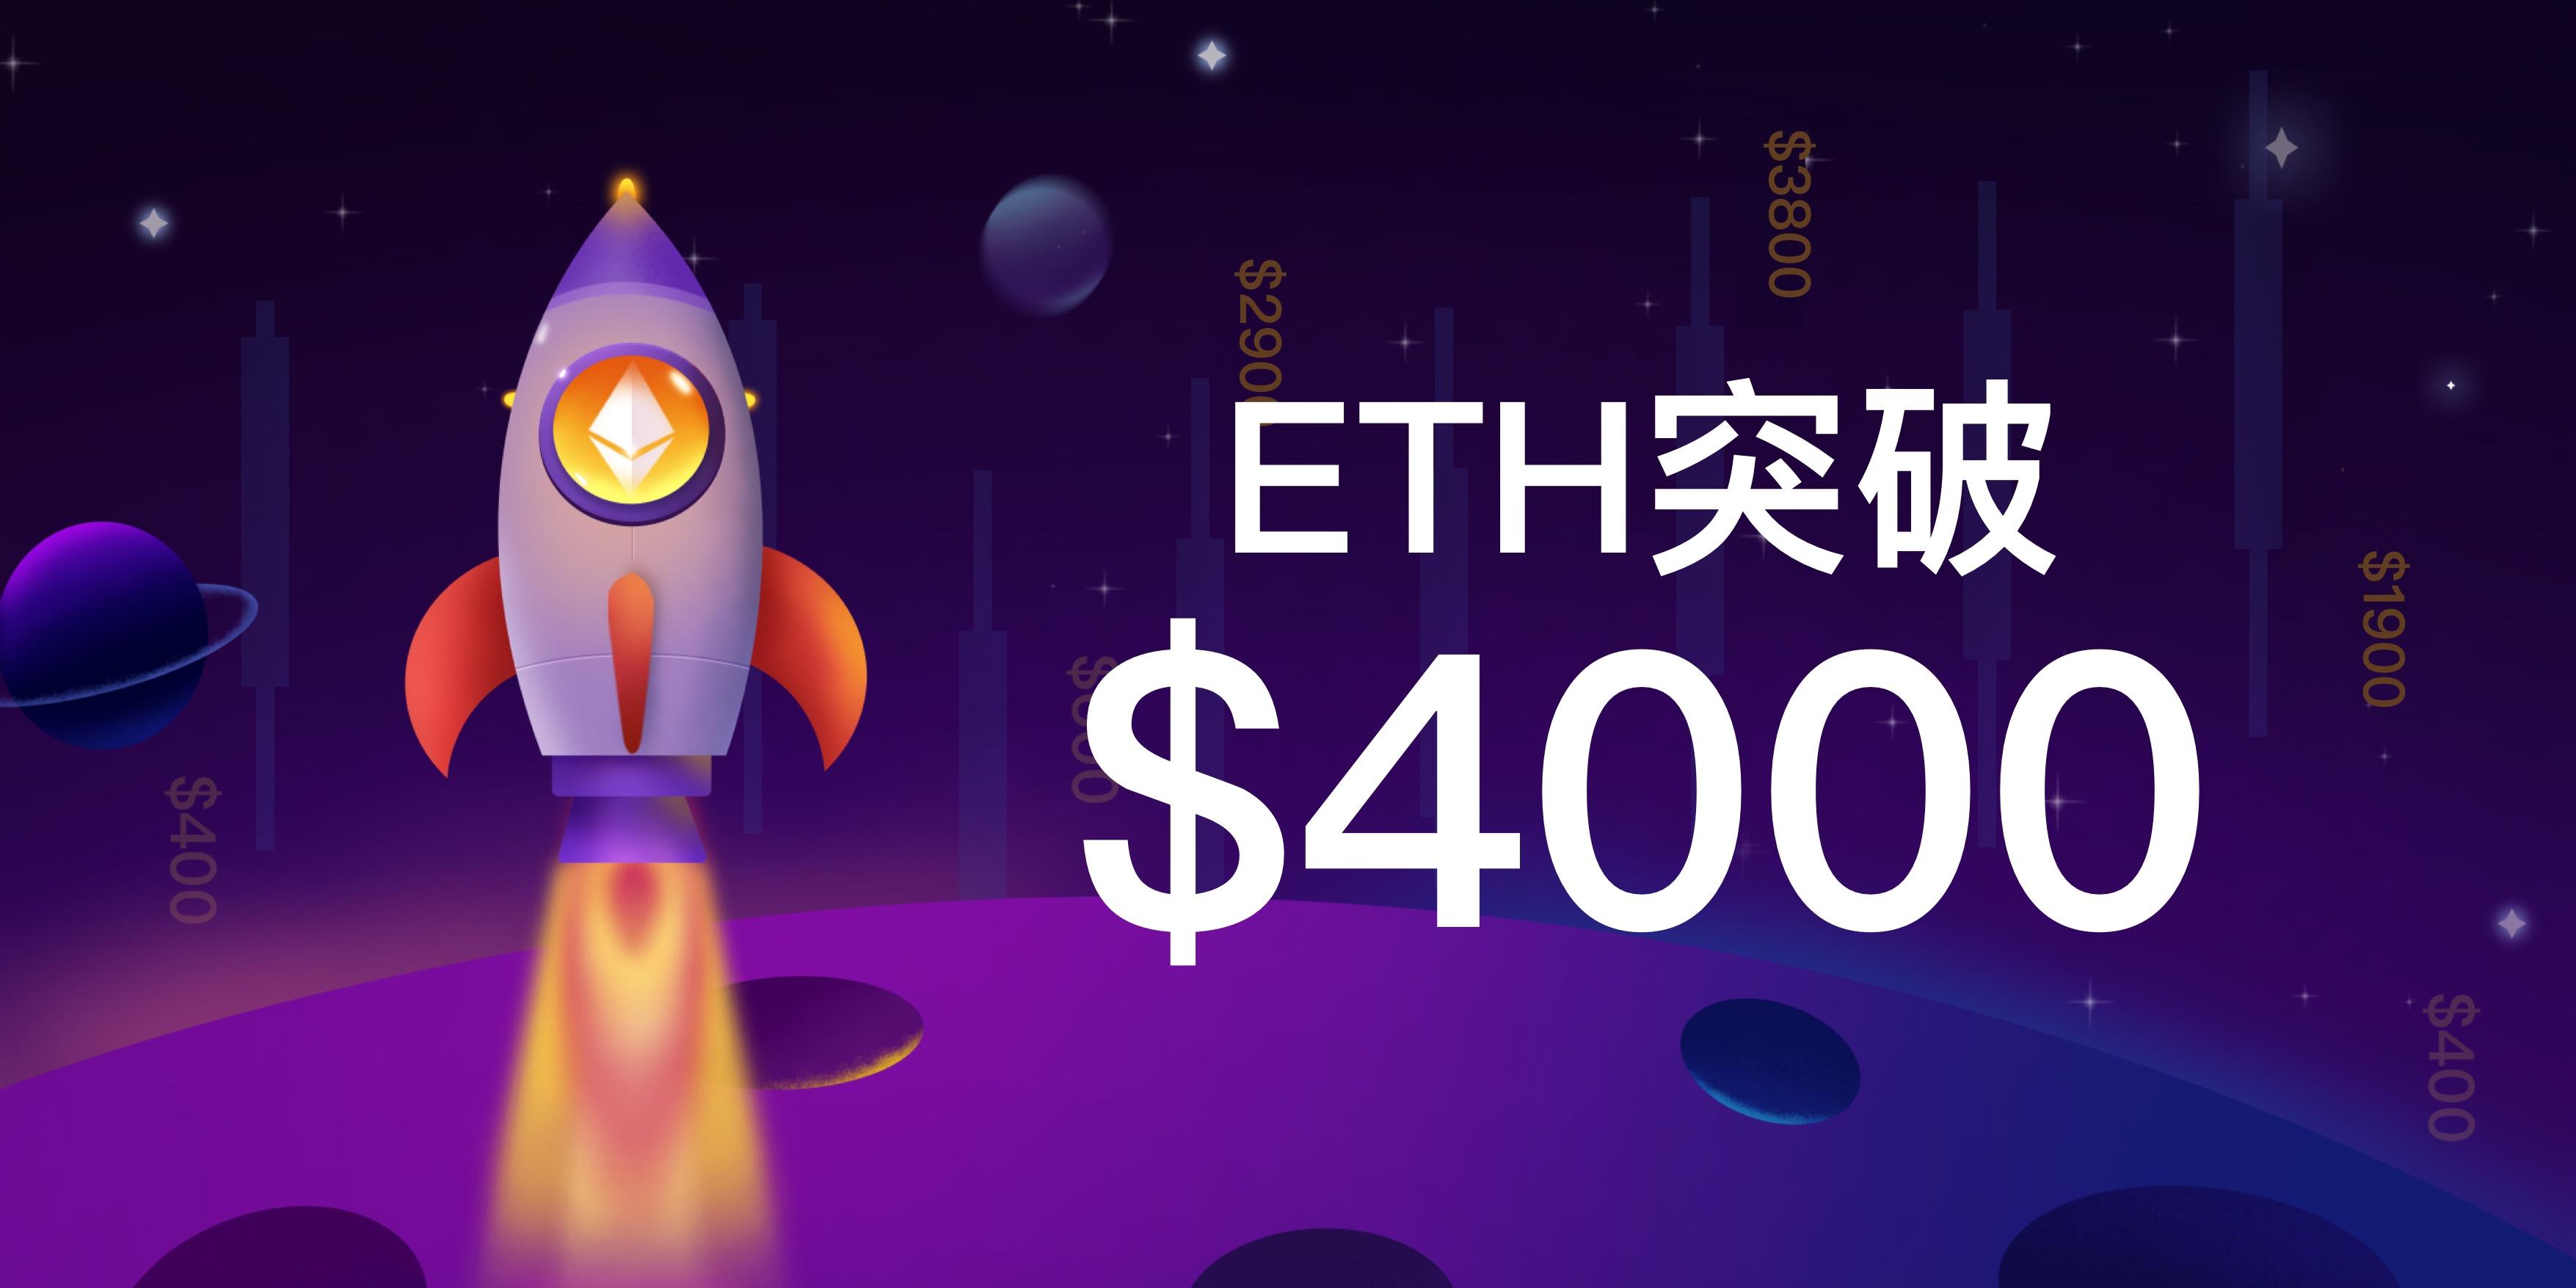 ETH突破4000美元关口 日内涨幅为3.16%